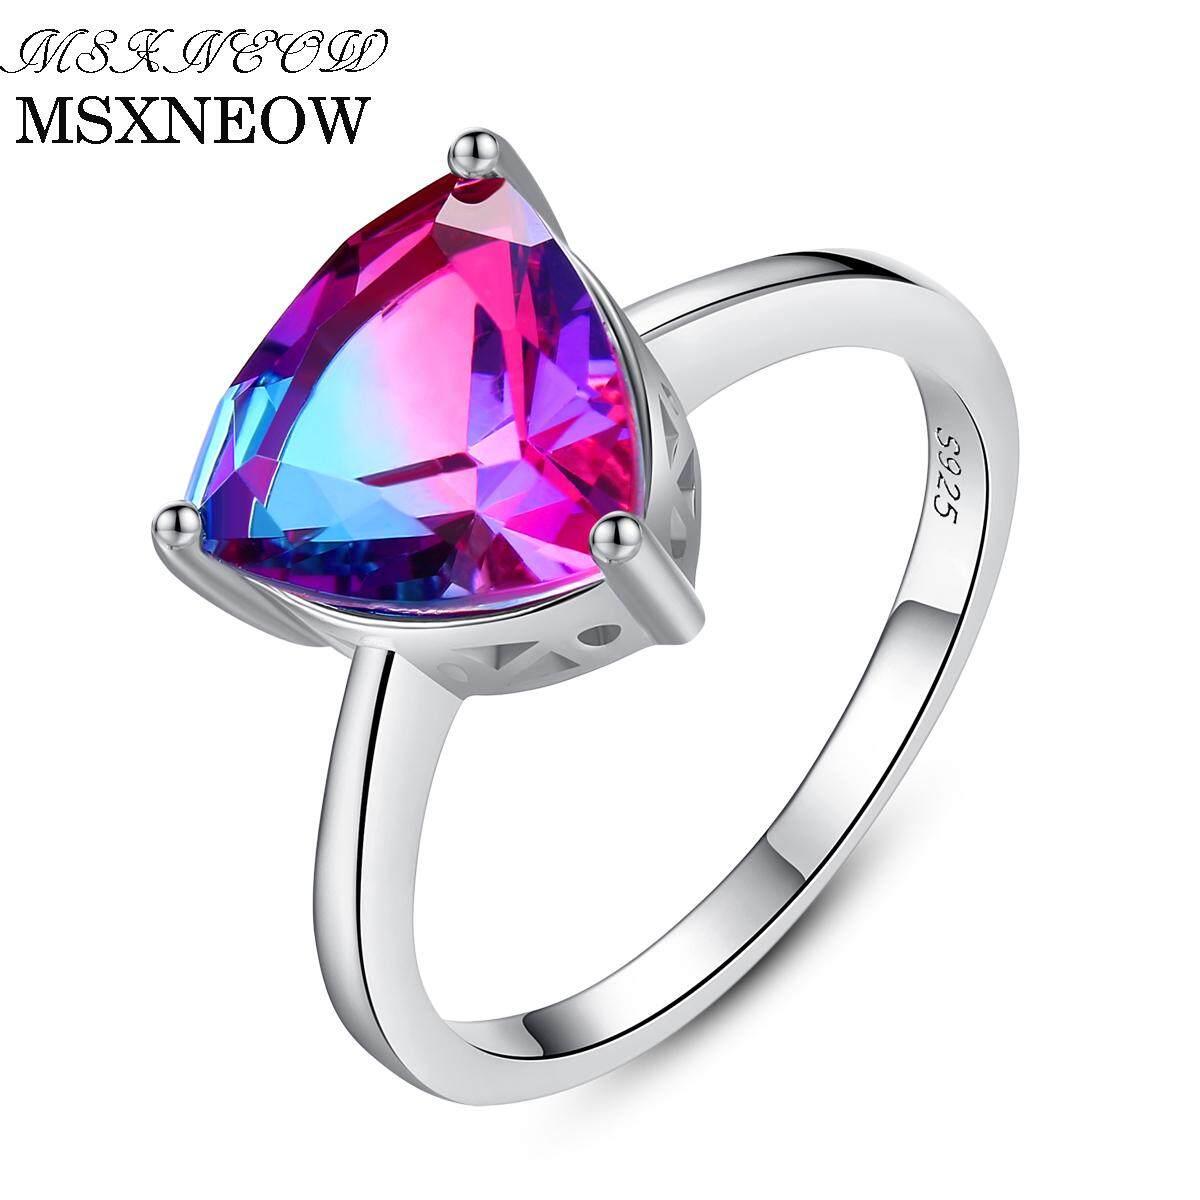 66decc65b9a57 MSXNEOW Adjustable wedding Ring Oval 100% Natural Gemstone Topaz 925  Sterling Silver Jewelry Fine Jewelry For Women SR0074